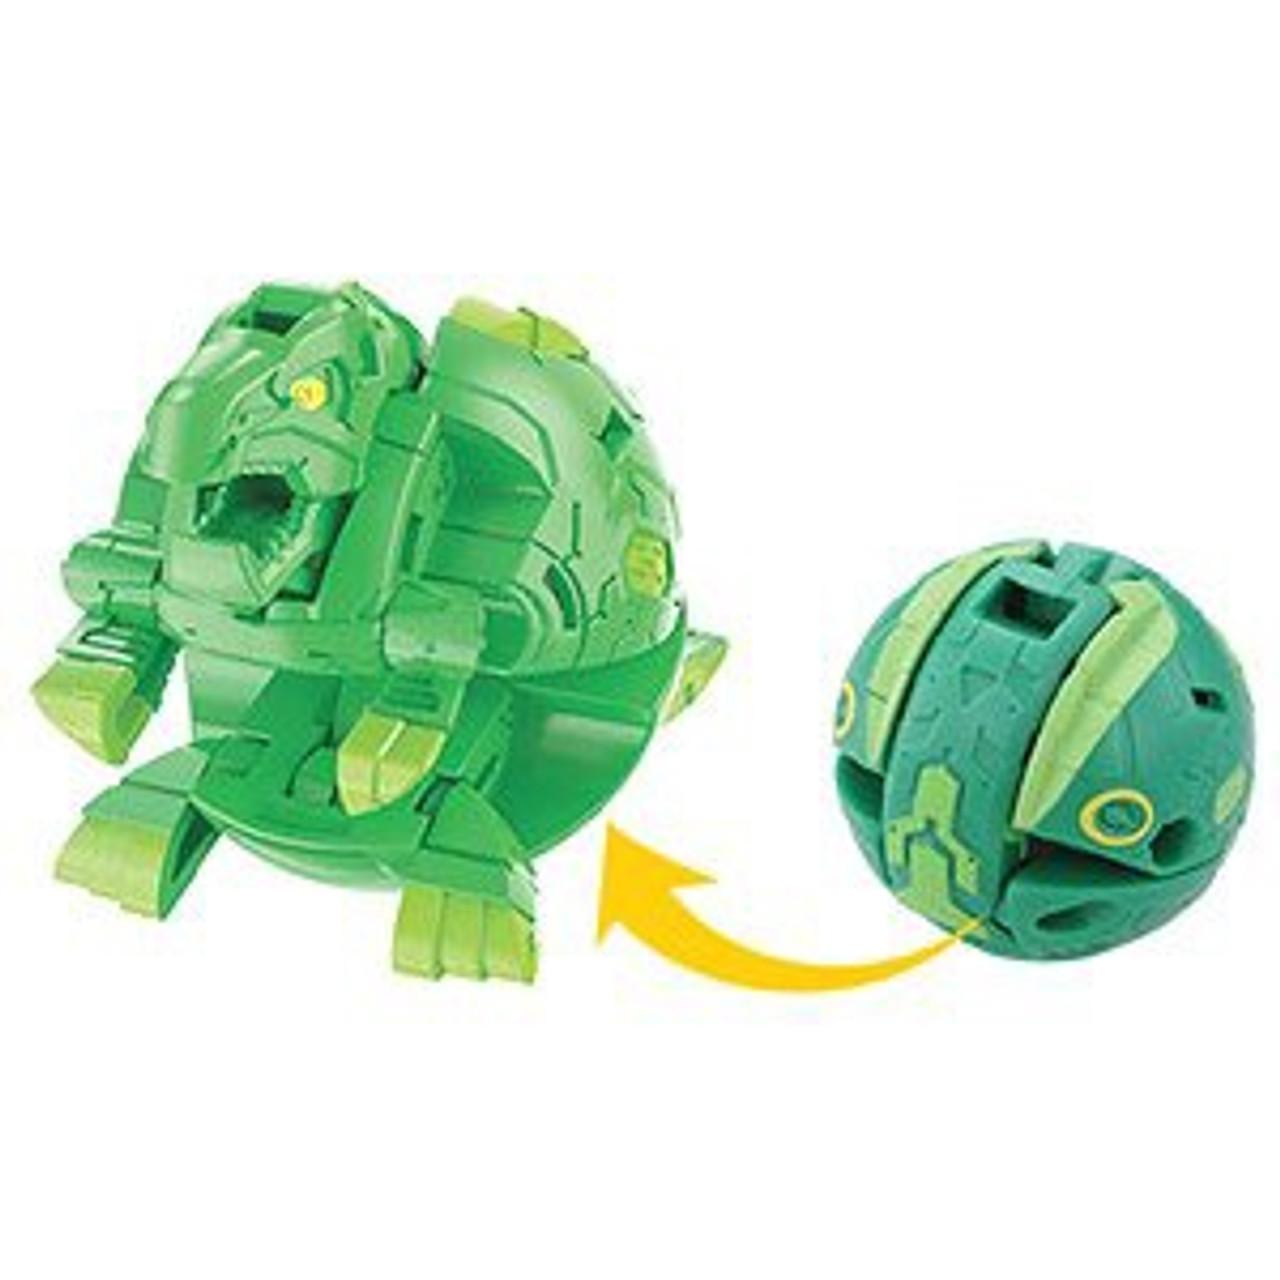 BAKUGAN BP BASIC 002 BALL 3C T-REX GREEN